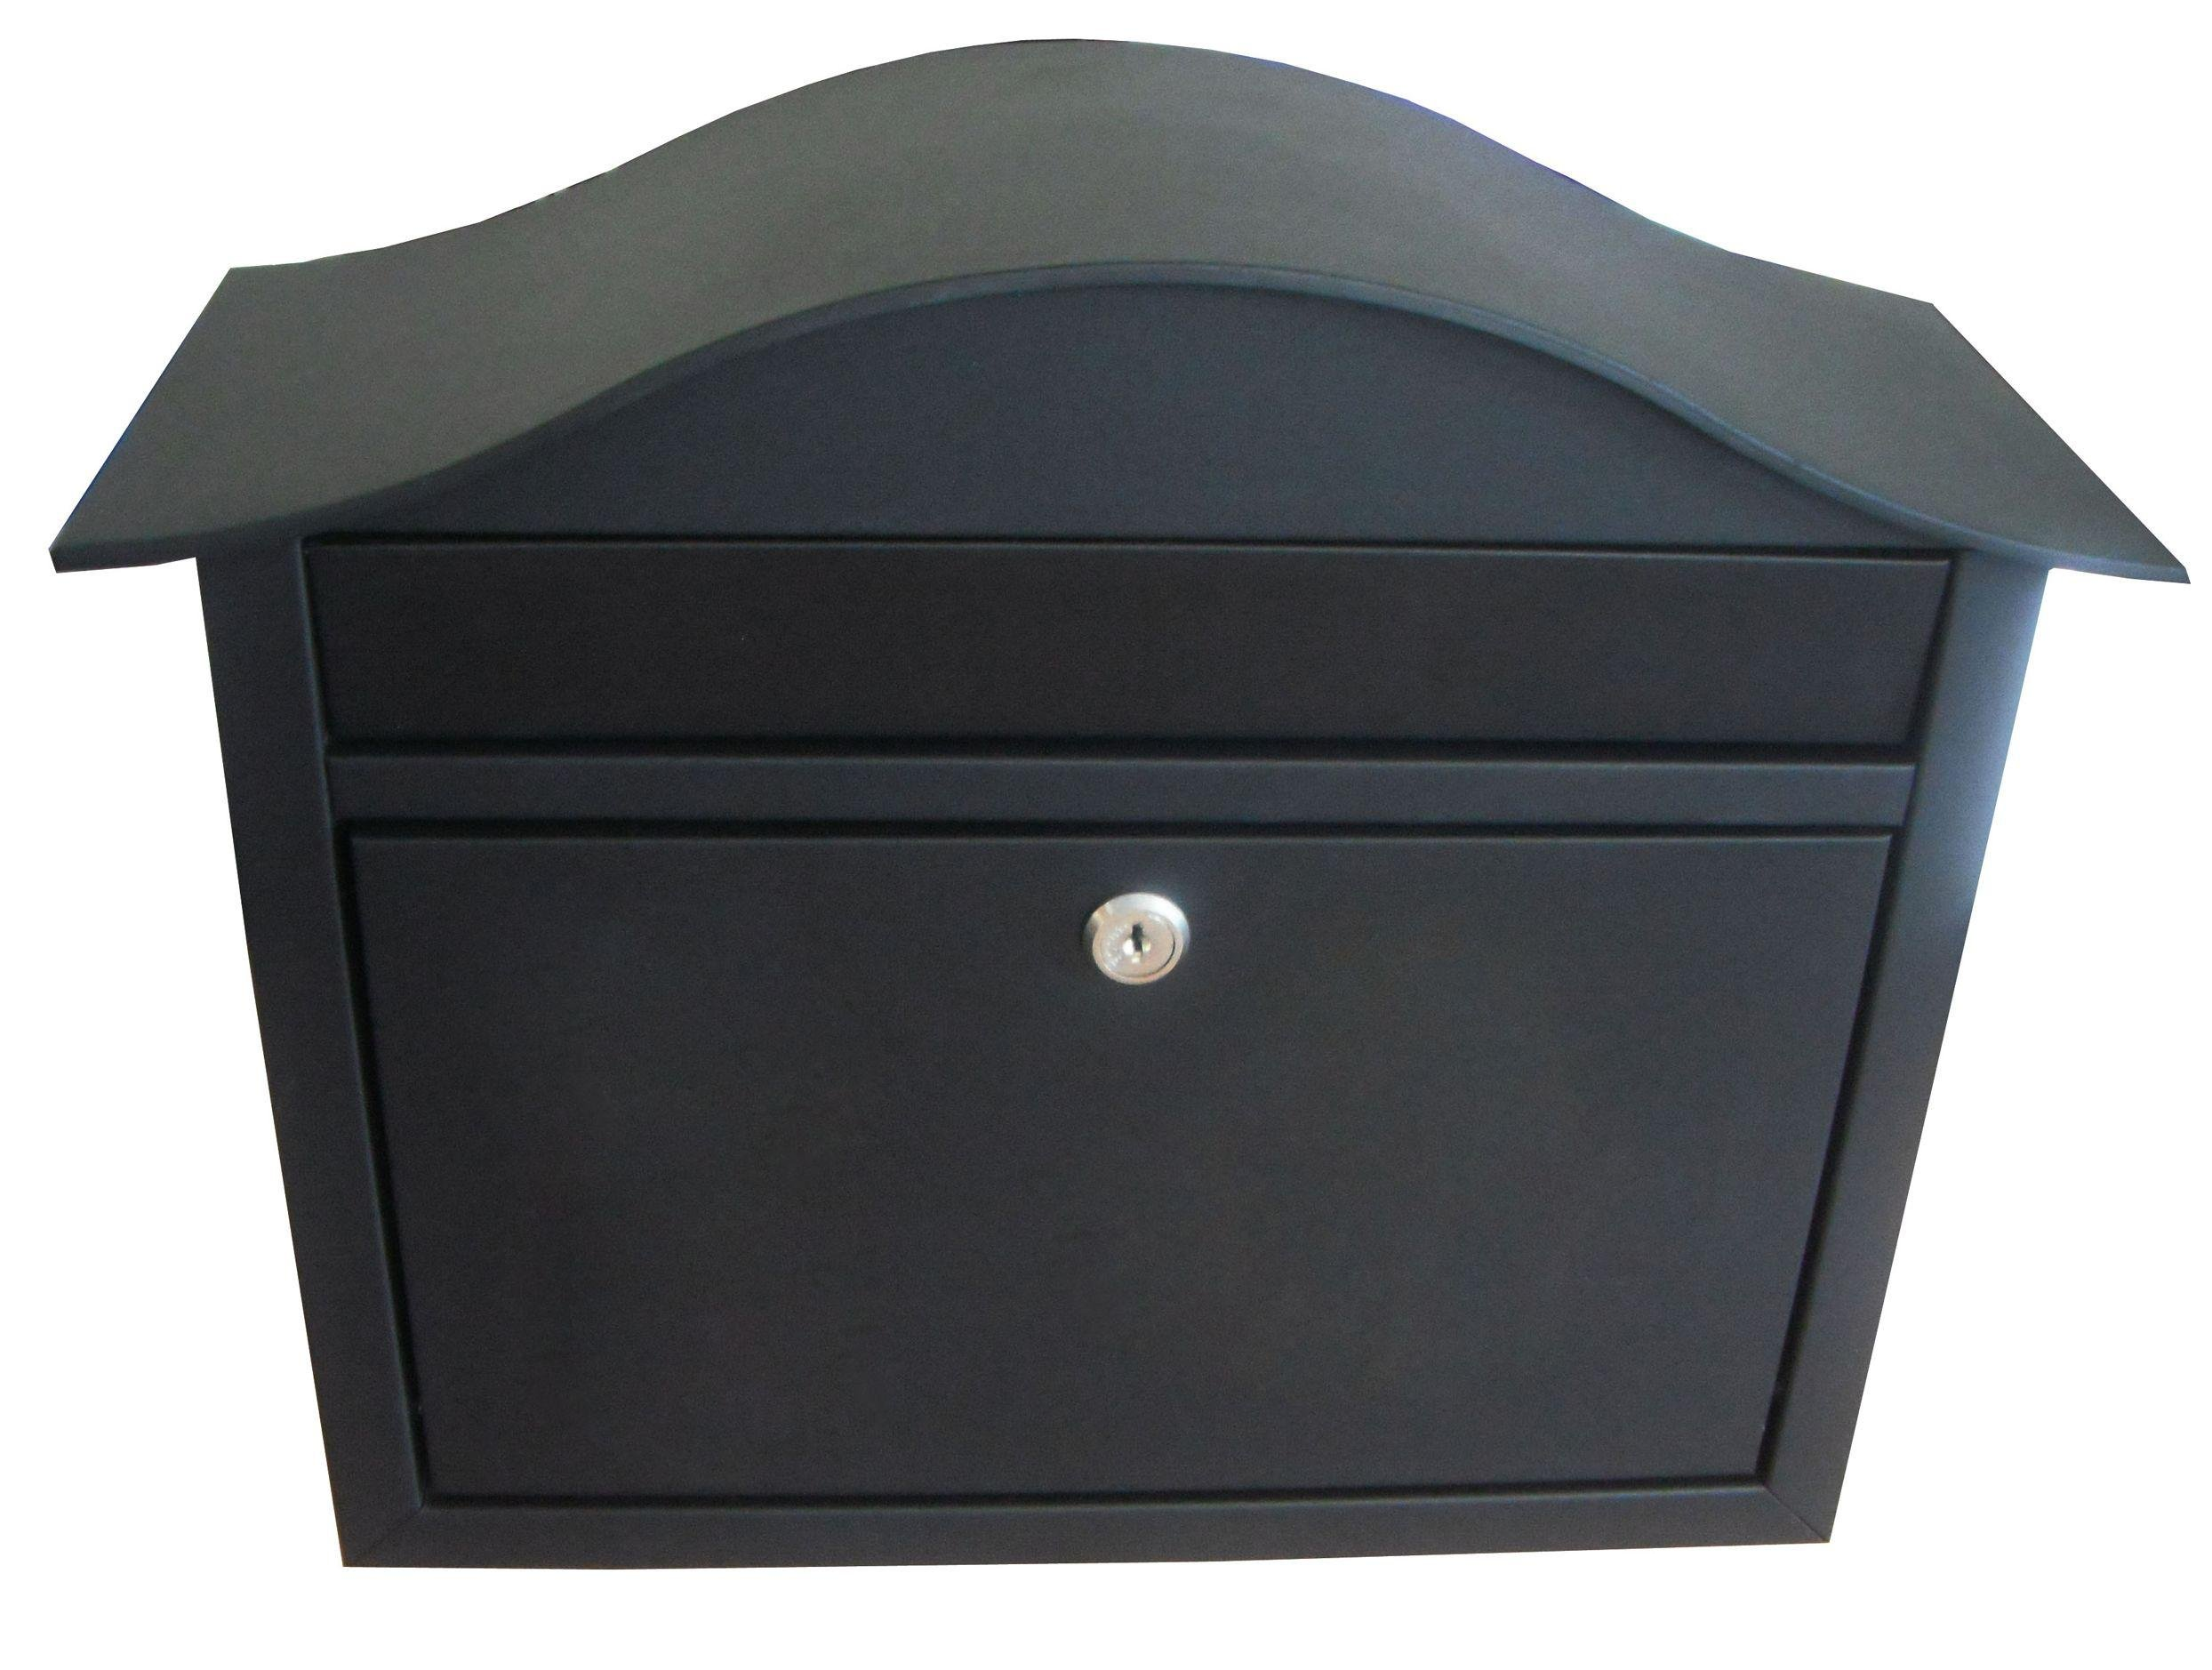 Image of Dublin Large Capacity Black Lockable Letter Box